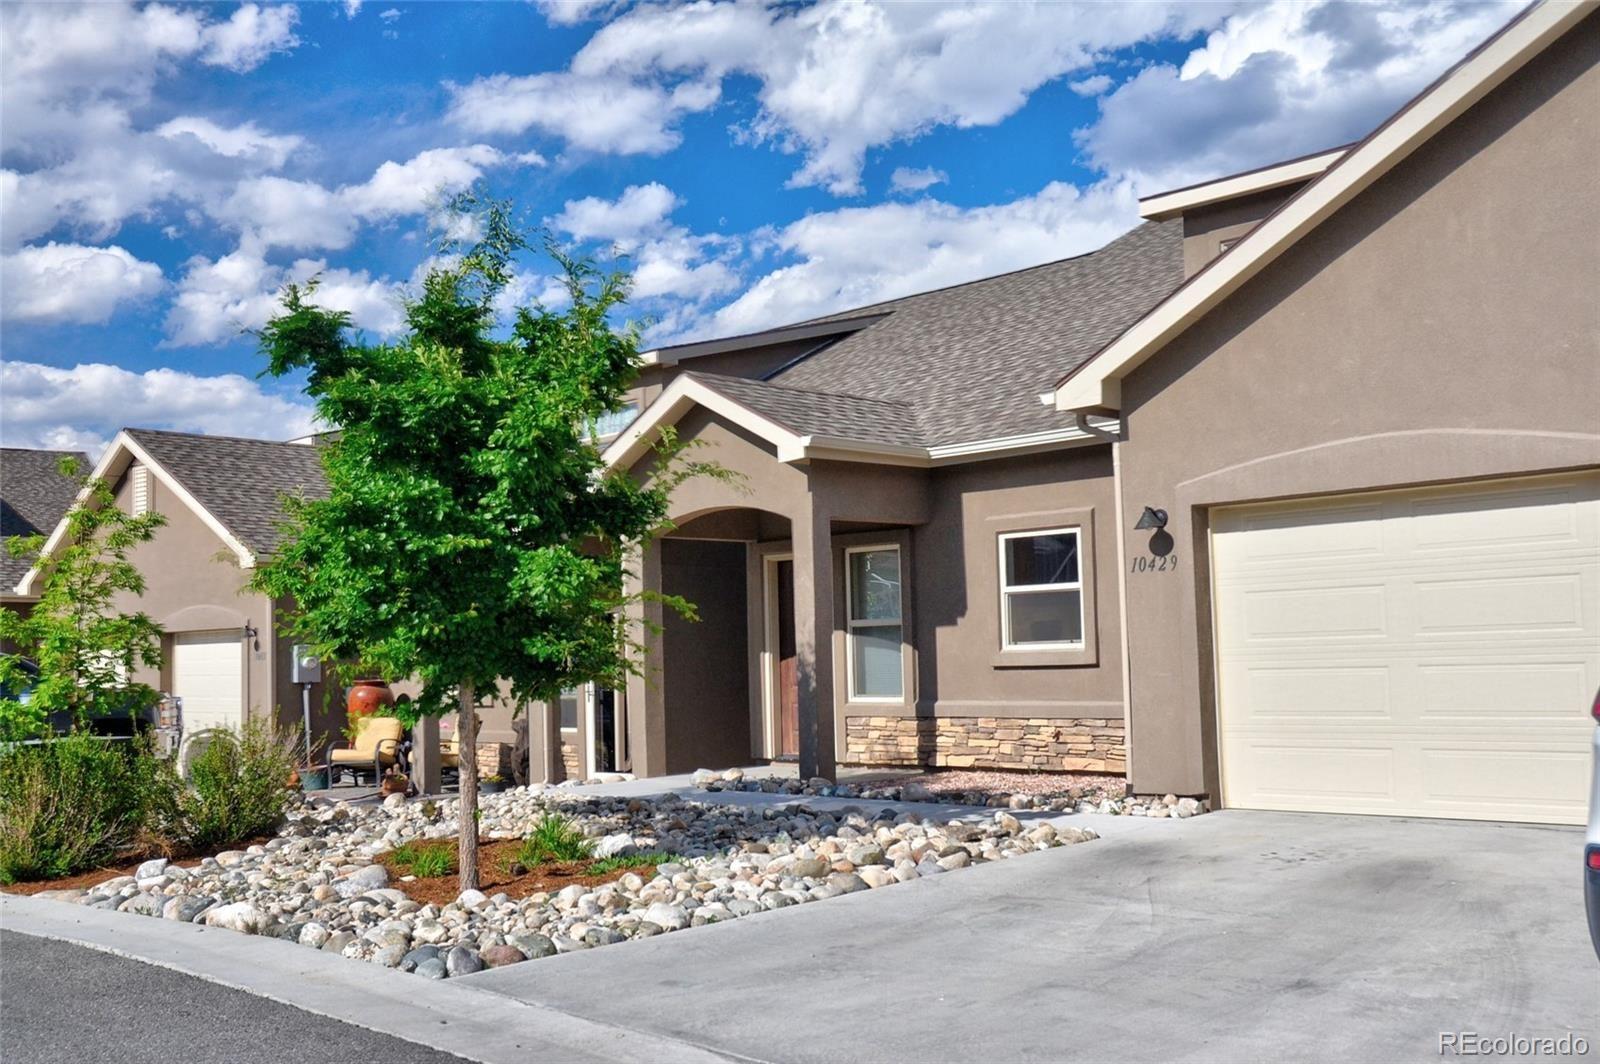 10429 Mesa View Court E, Poncha Springs, CO 81242 - #: 4421893